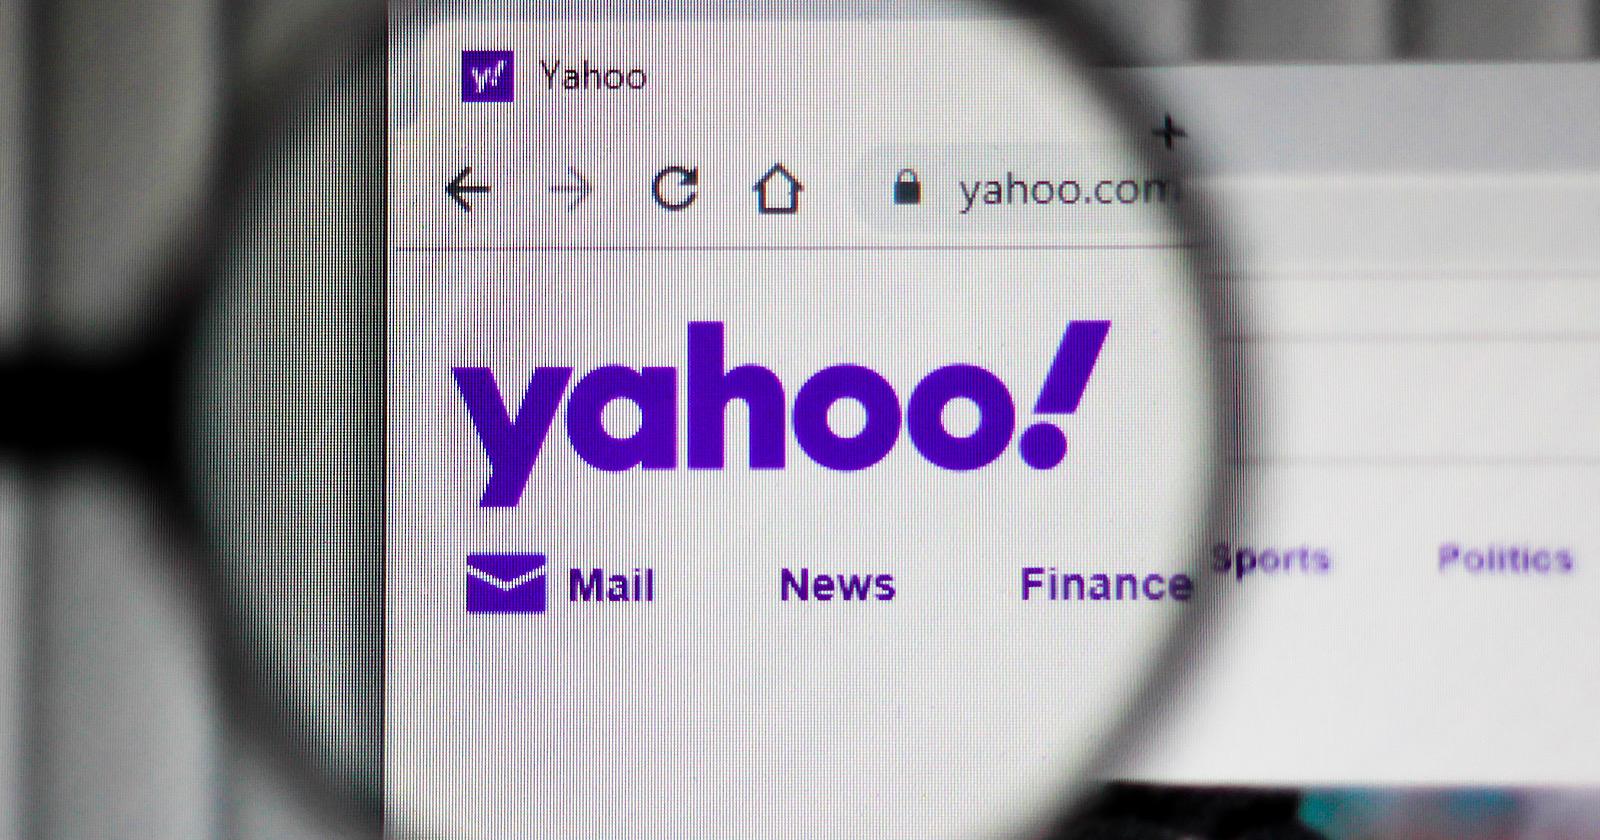 Yahoo Groups to Shut Down December 15